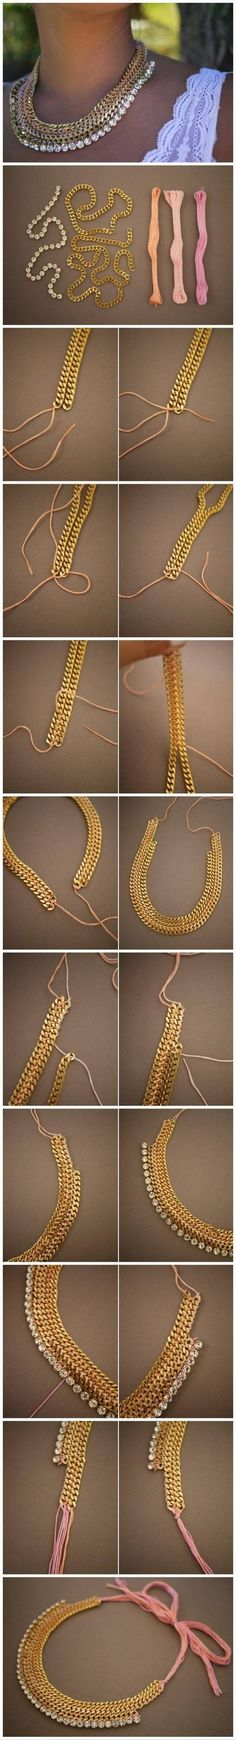 DIY Classy Necklace diy craft crafts craft ideas easy crafts diy ideas crafty easy diy diy jewelry craft necklace diy necklace jewelry diy fashion craft crafts for girls